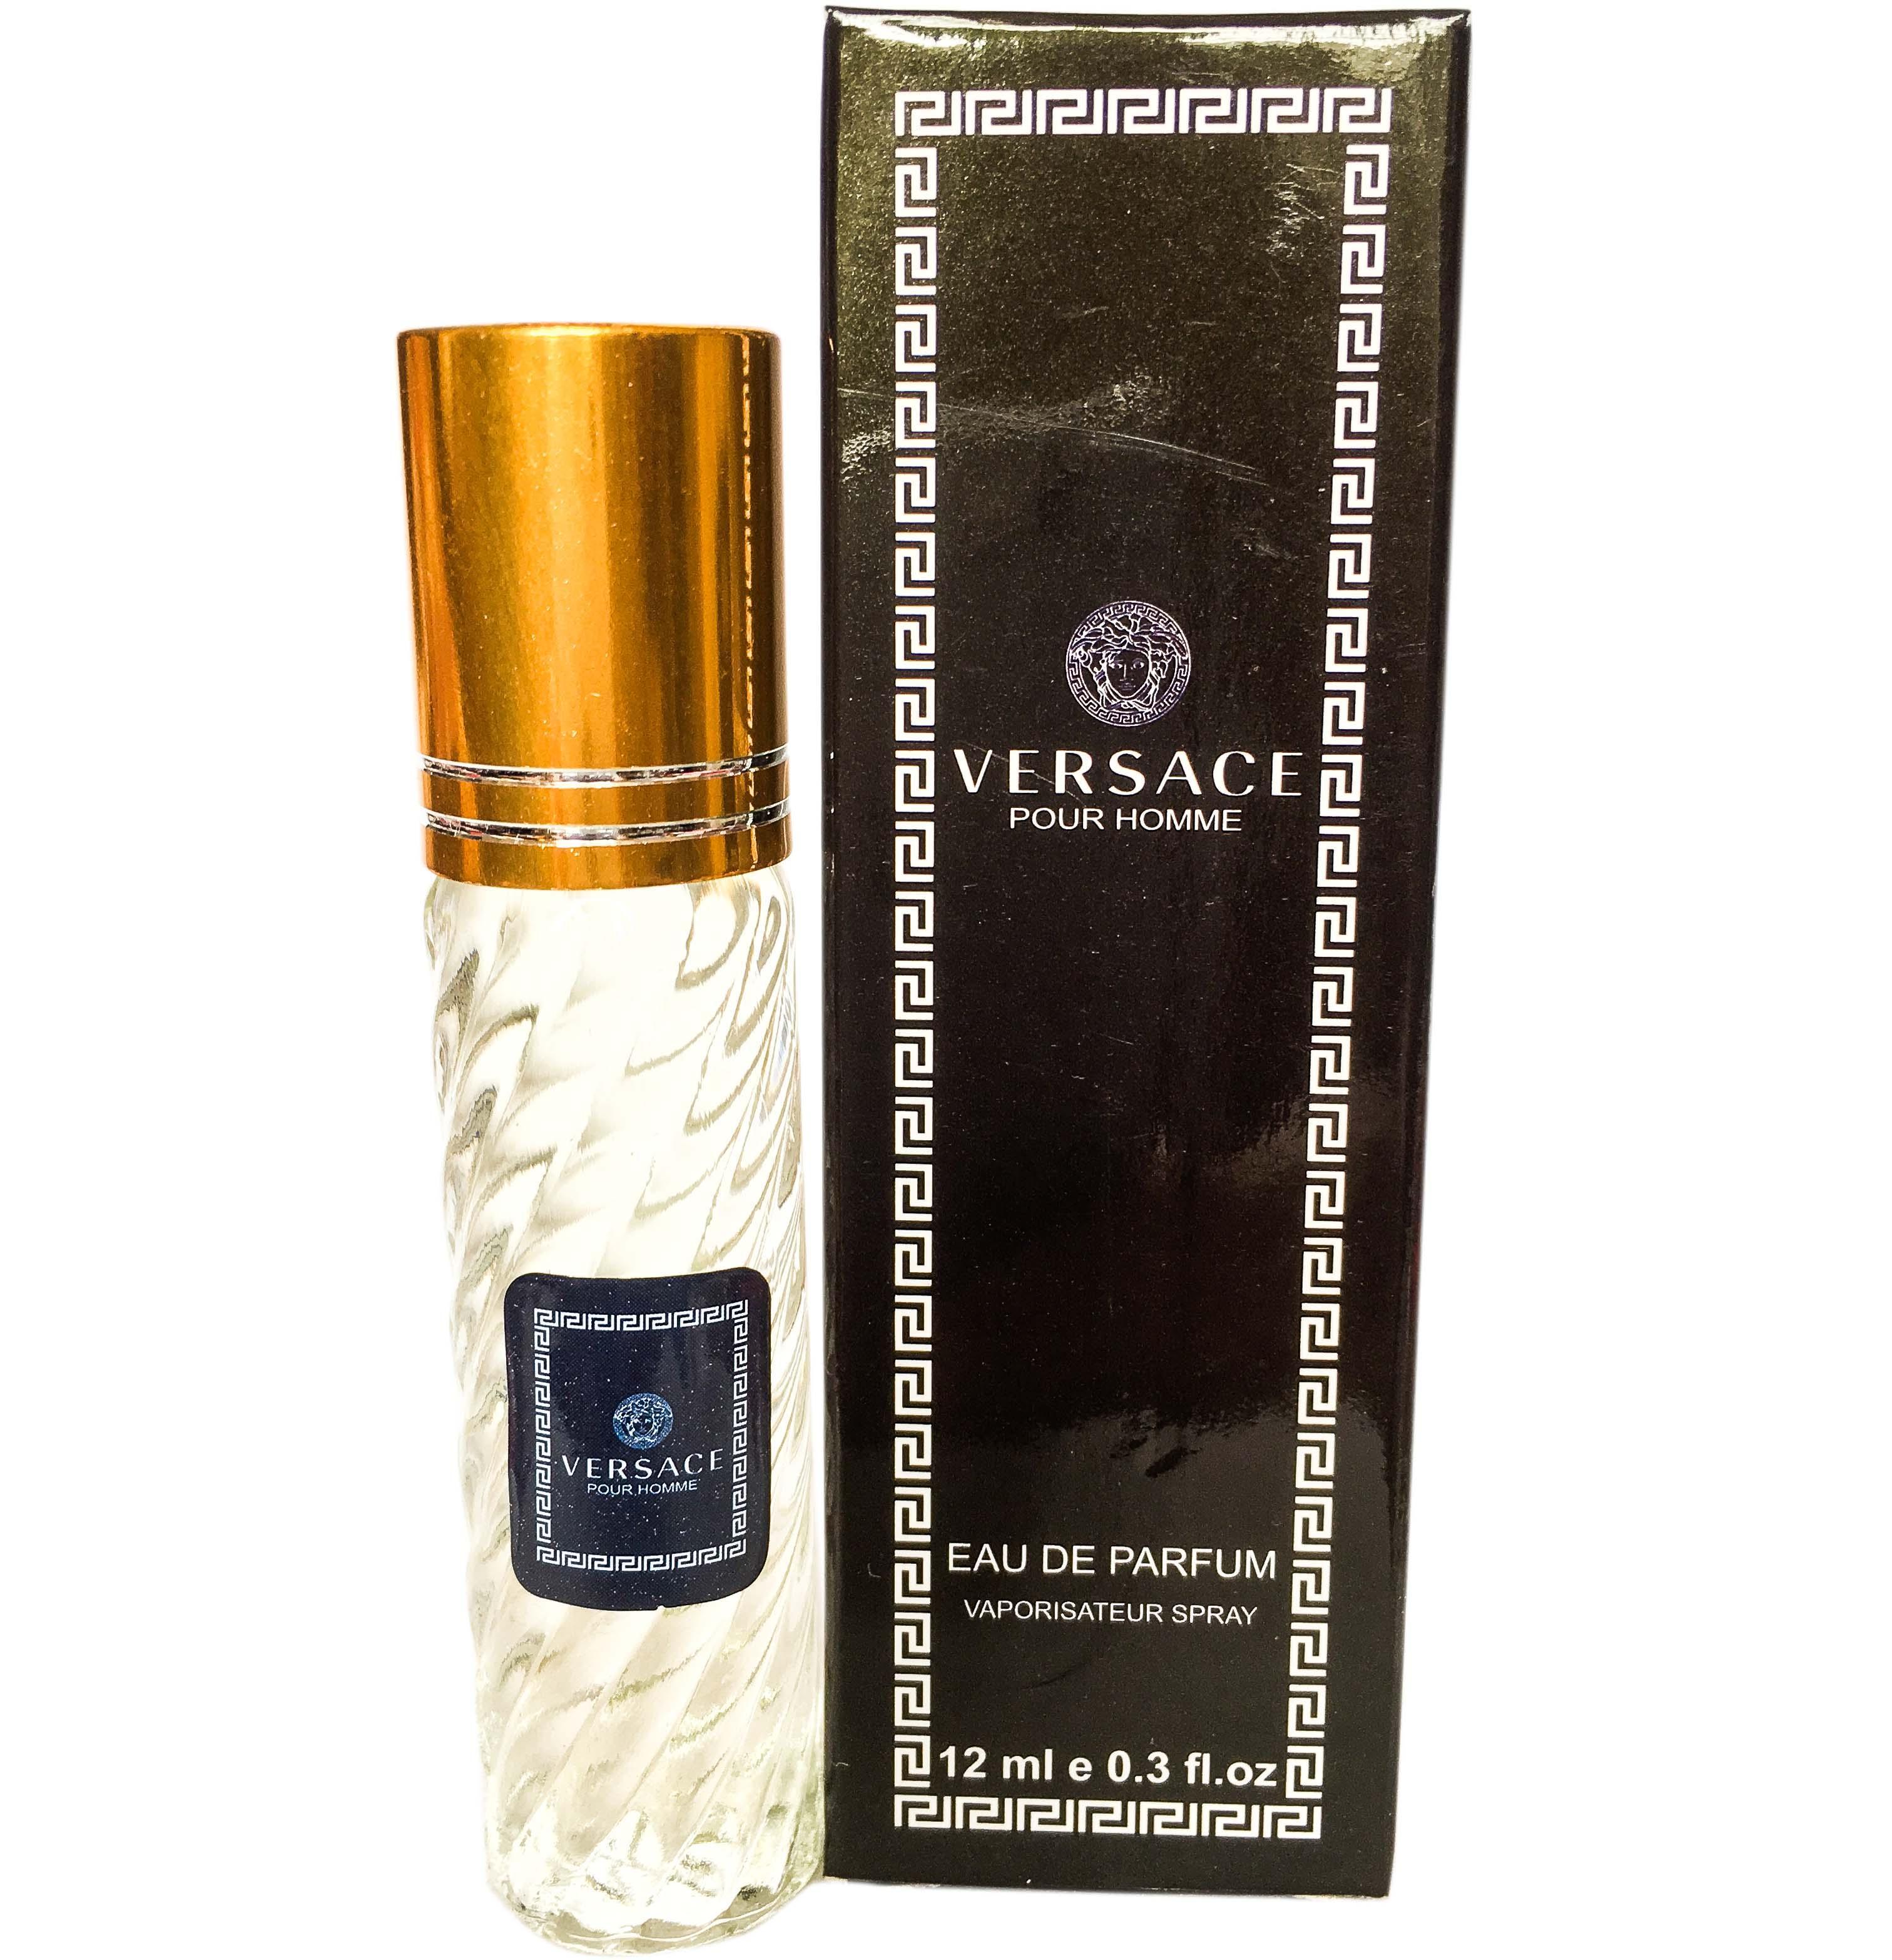 Versace Pour Homme Tinh Dầu Thơm Pháp Hparfum [ Mùi Nam ]